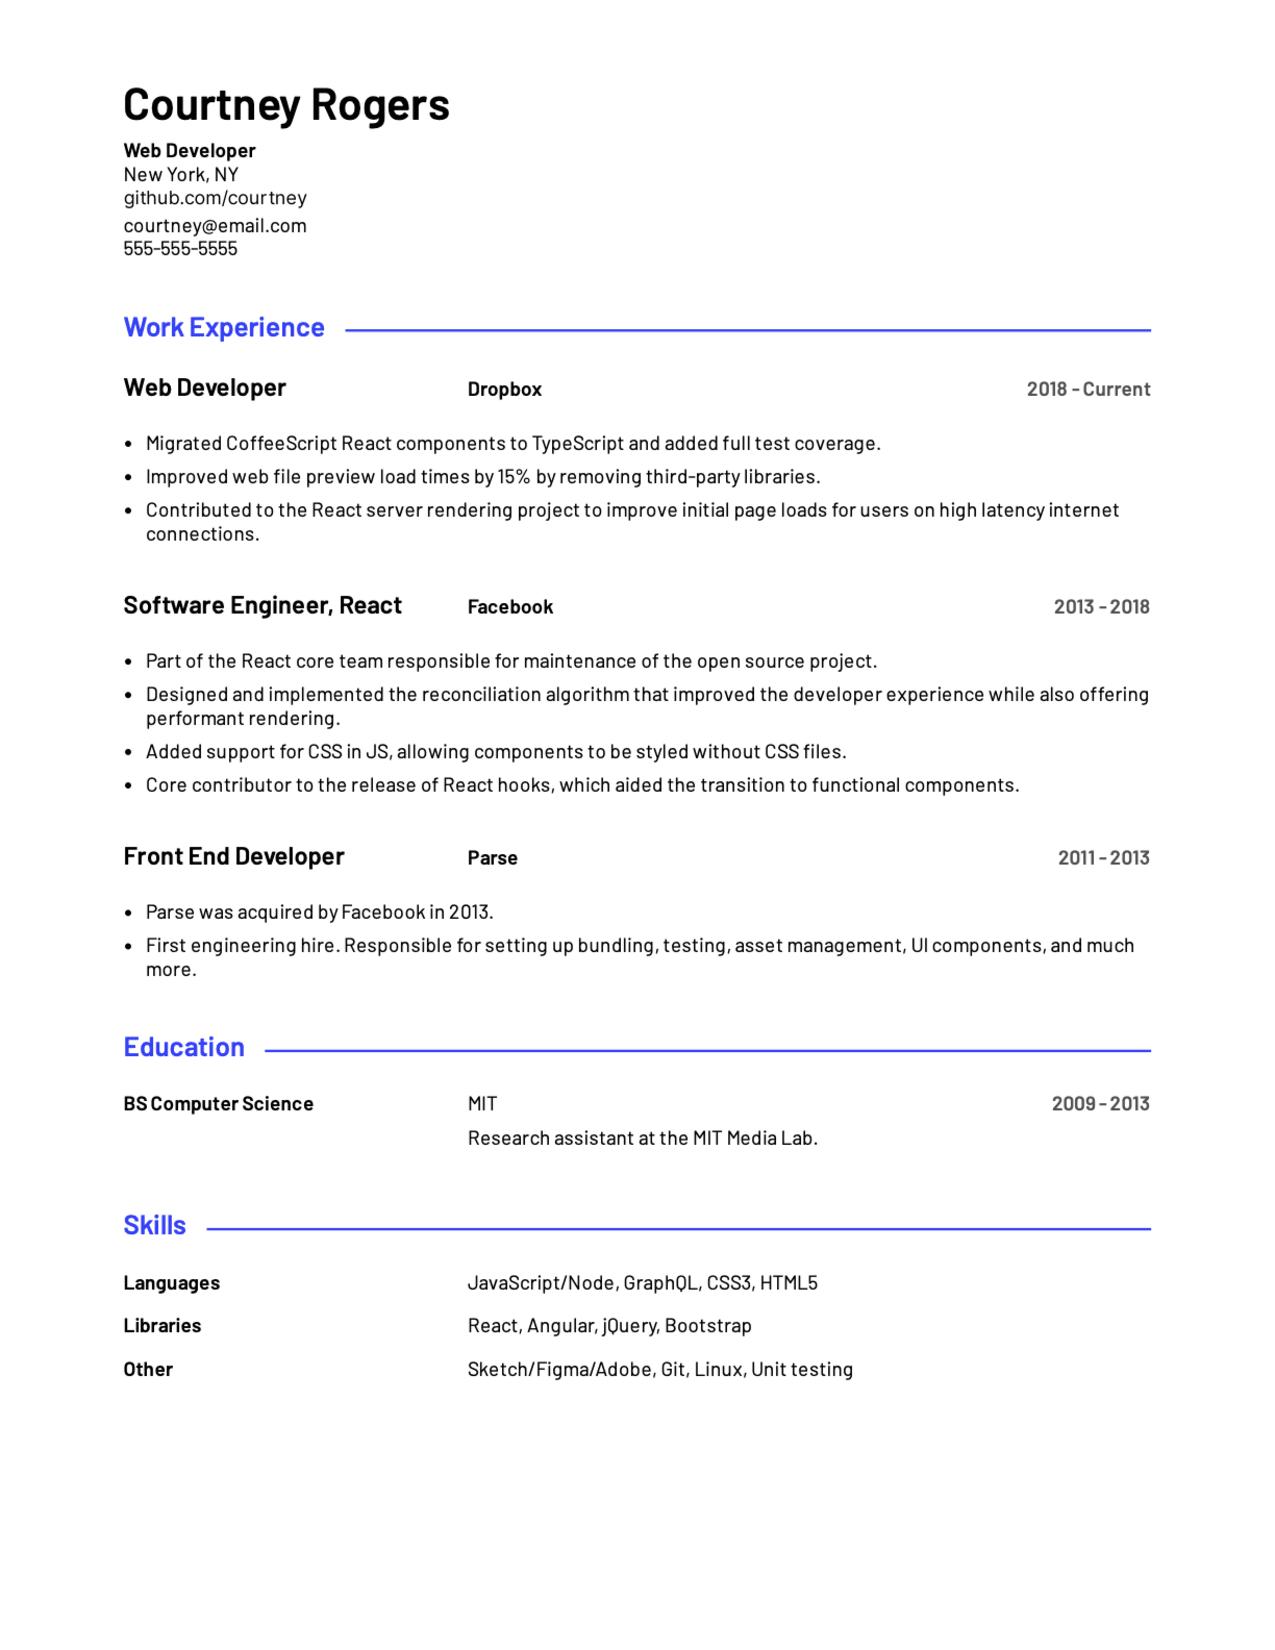 Professional Web Developer resume template sample.